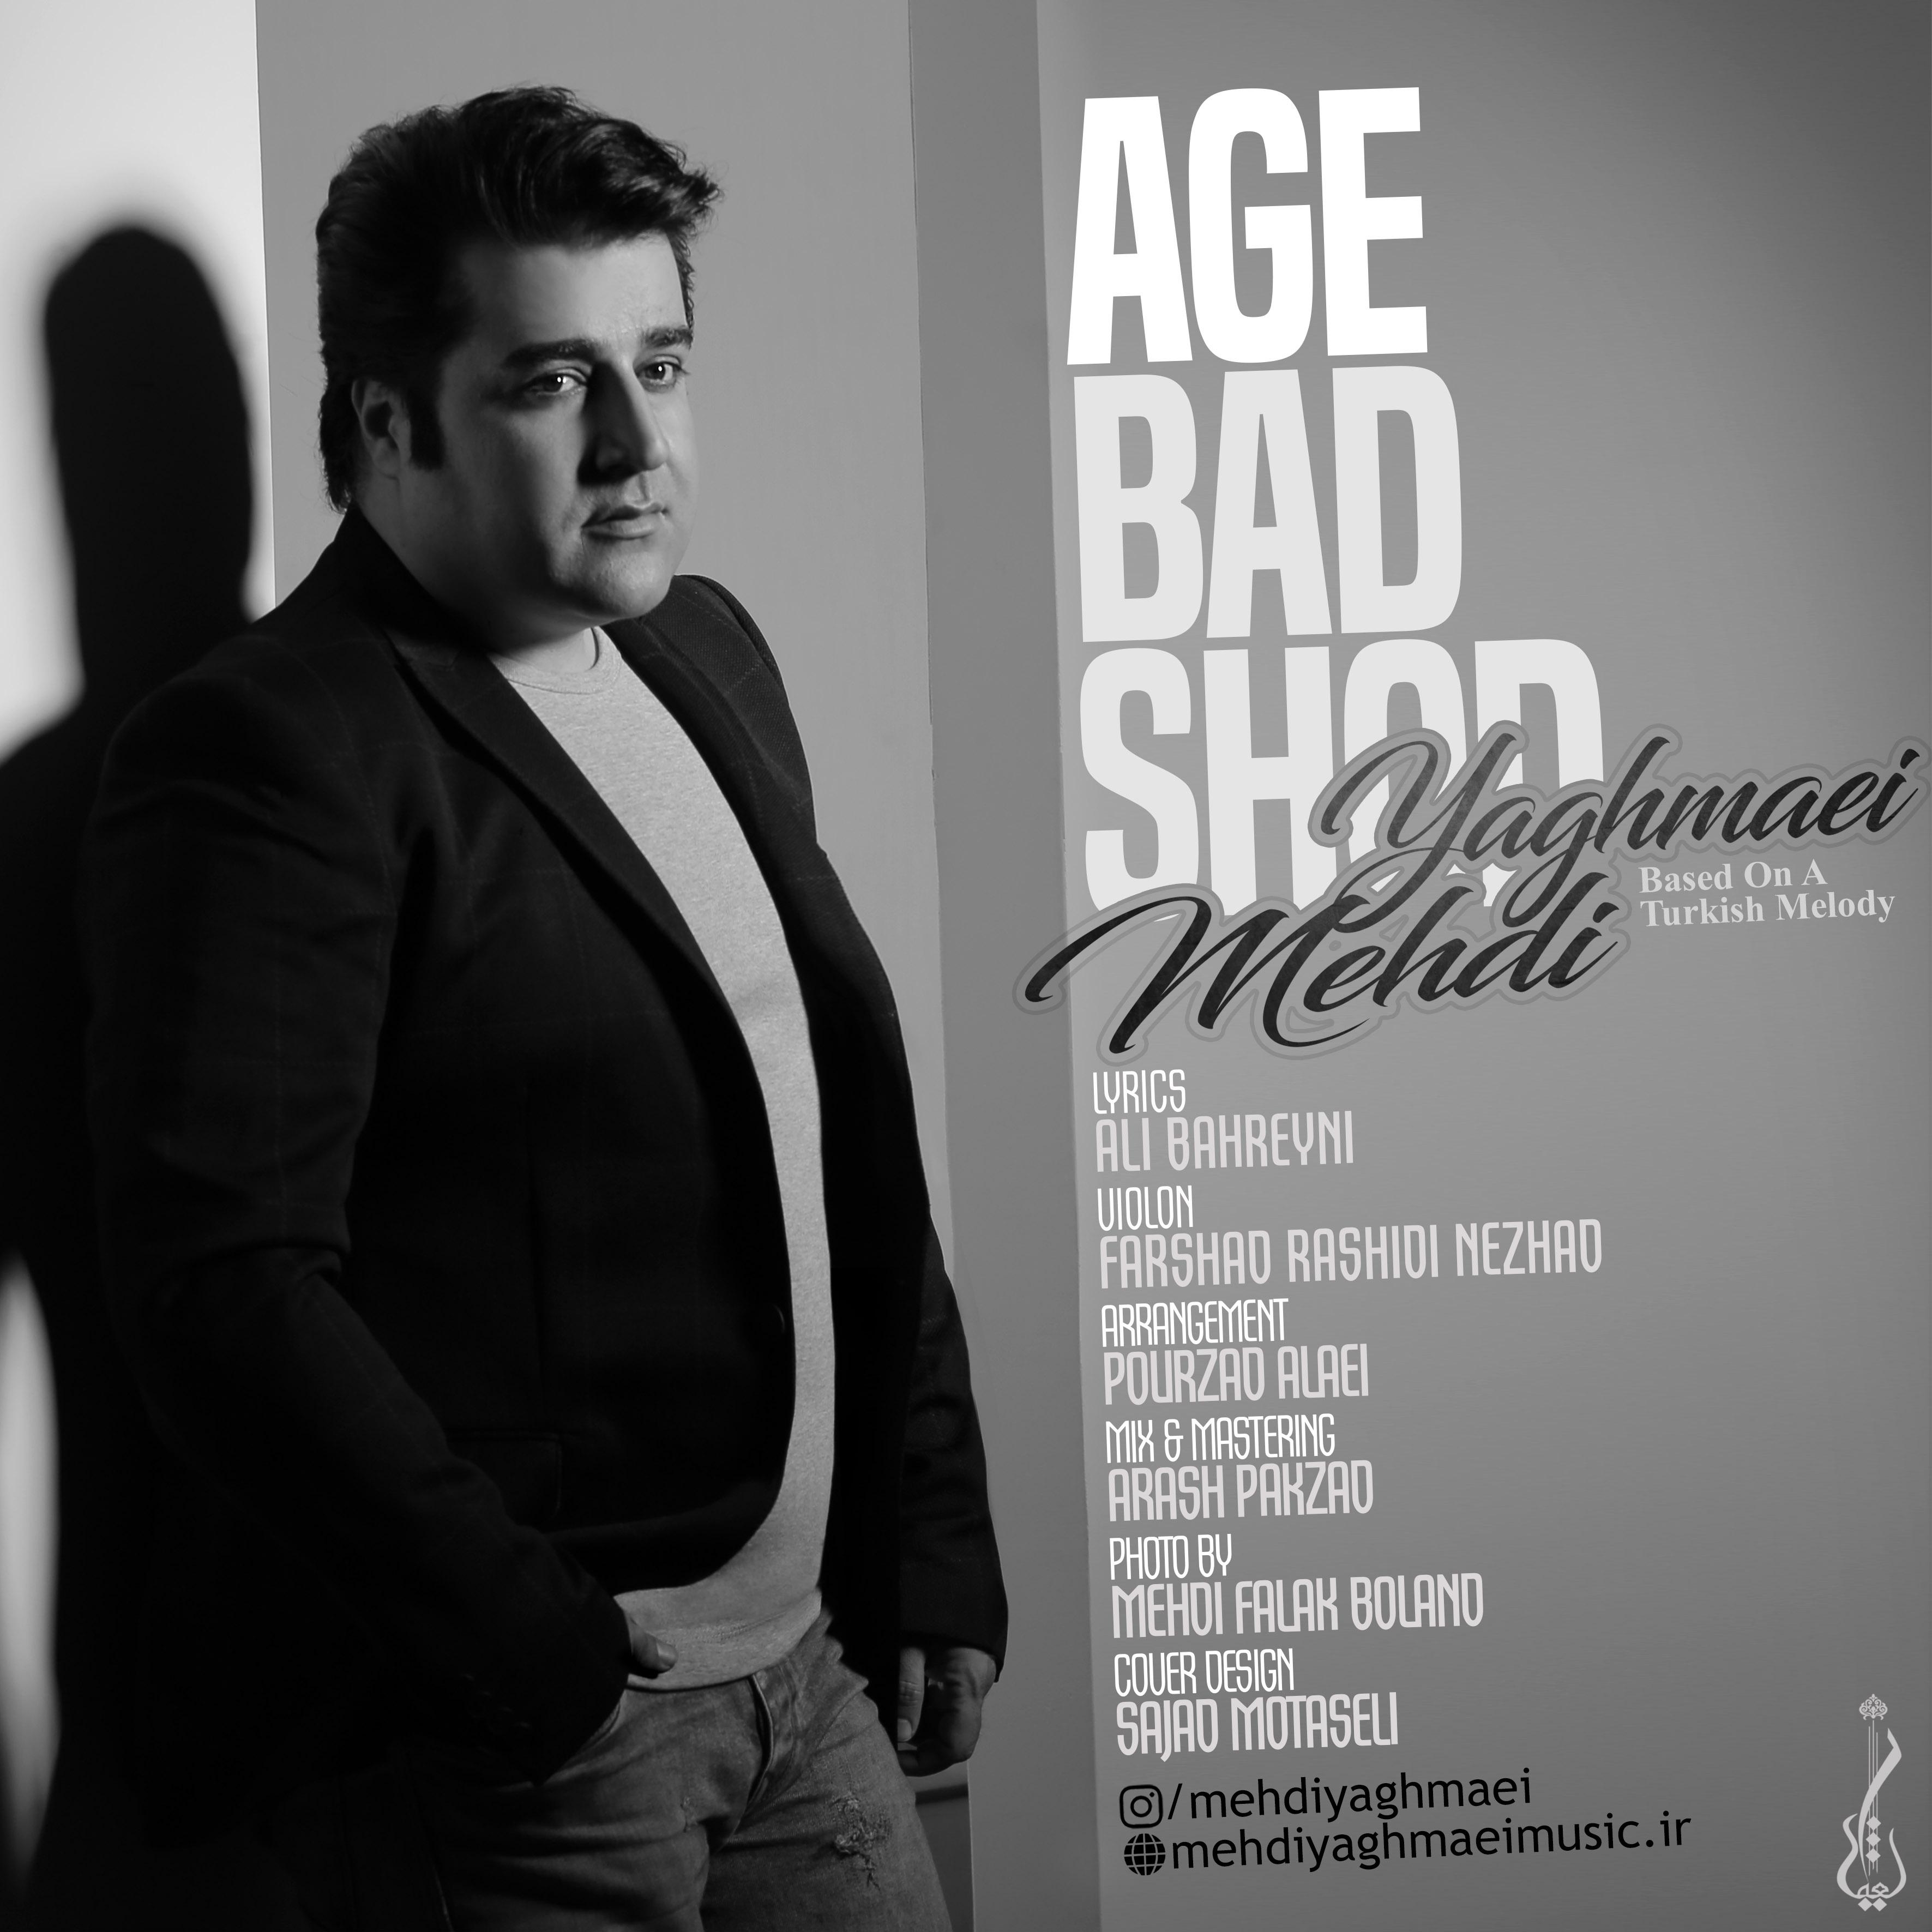 Mehdi Yaghmaei – Age Bad Shod